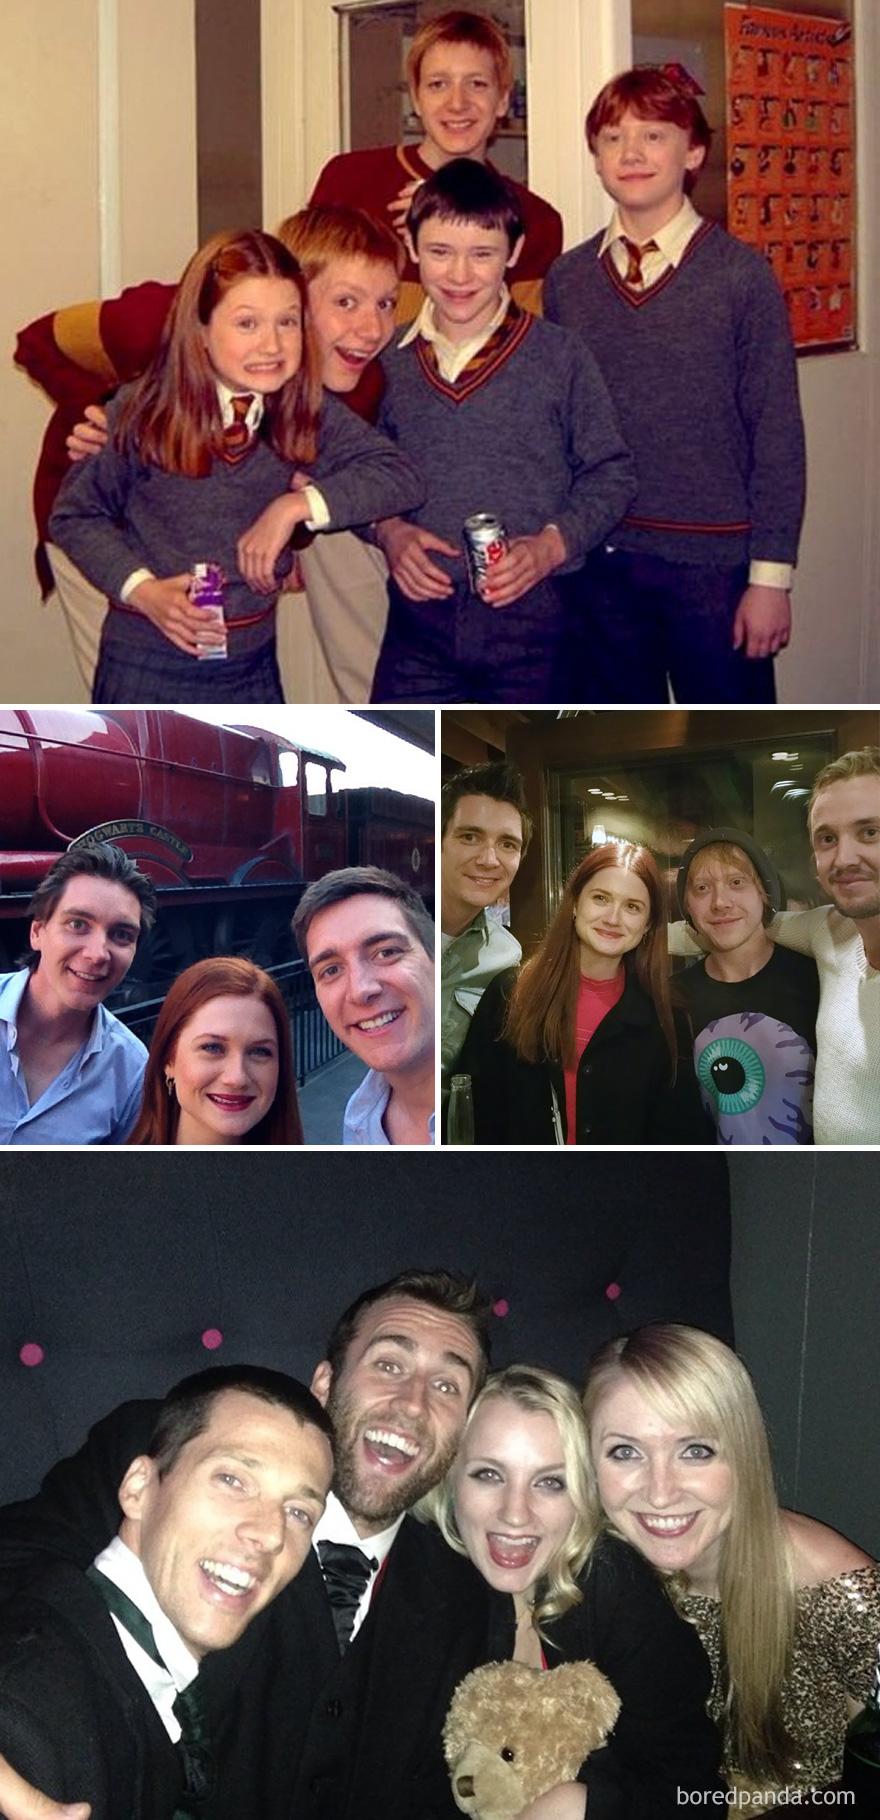 Harry Potter: 2002 Vs. 2014/2015